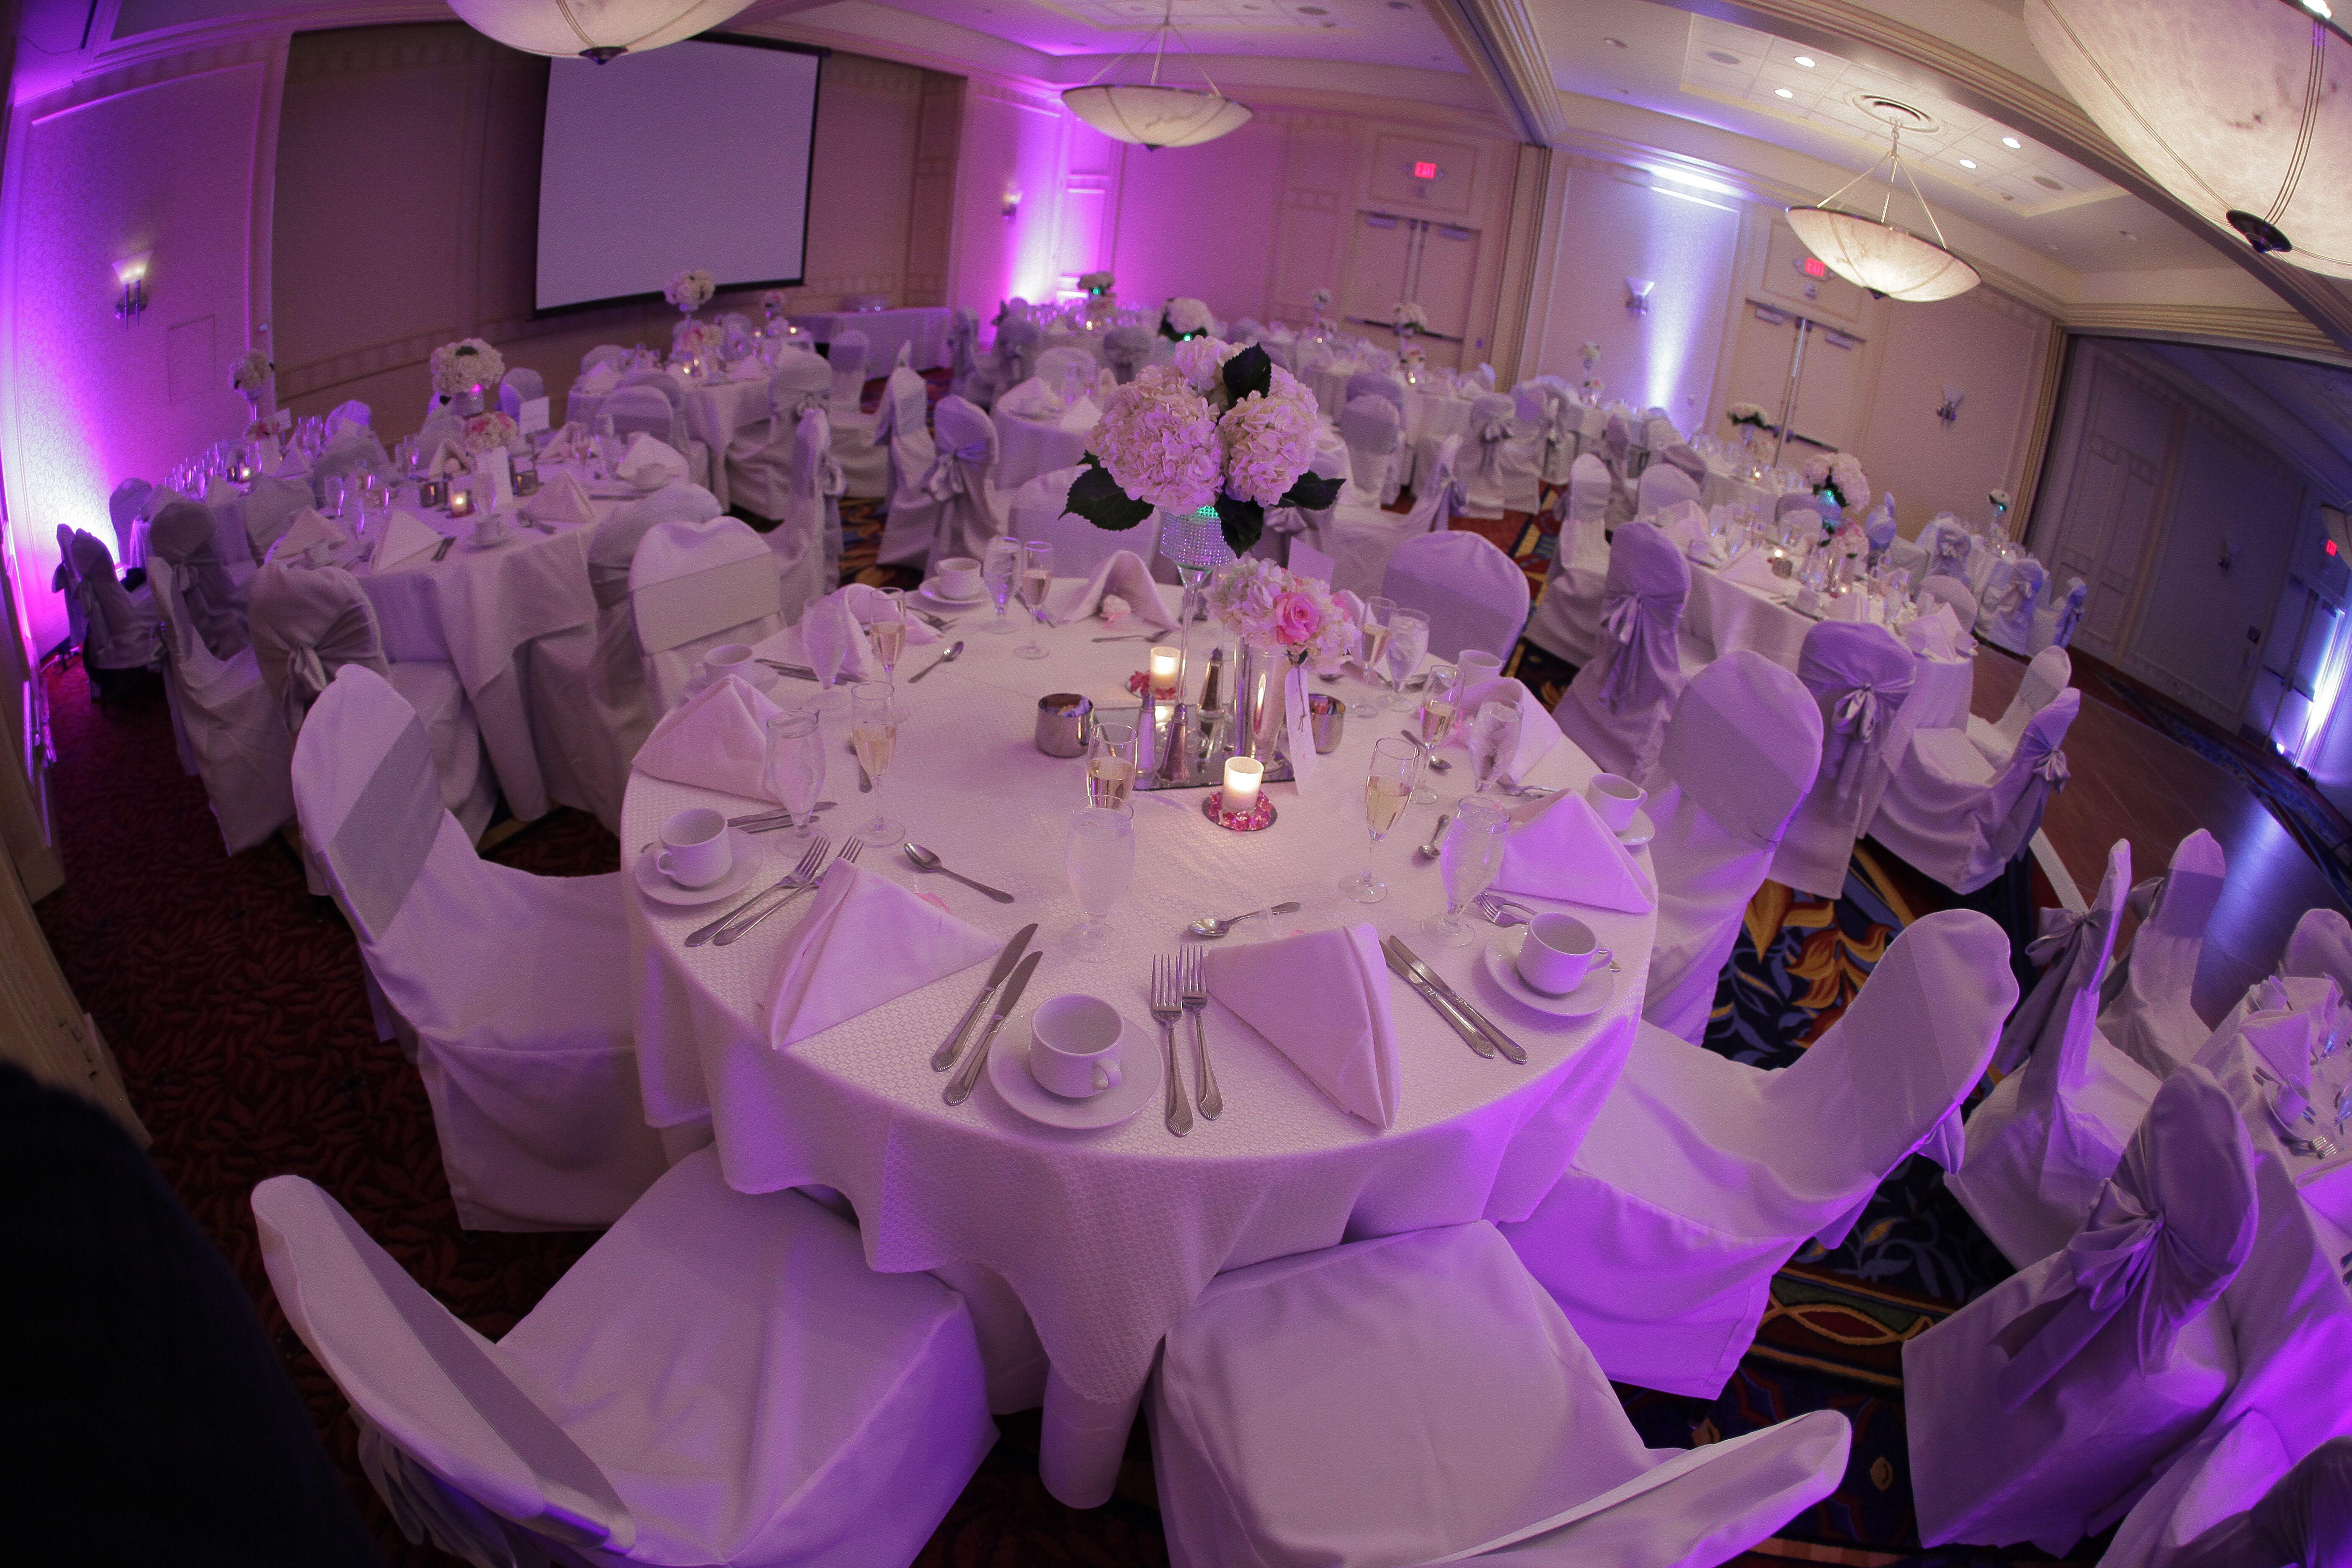 Wedding reception venues in north bergen nj the knot saddle brook marriott arubaitofo Images